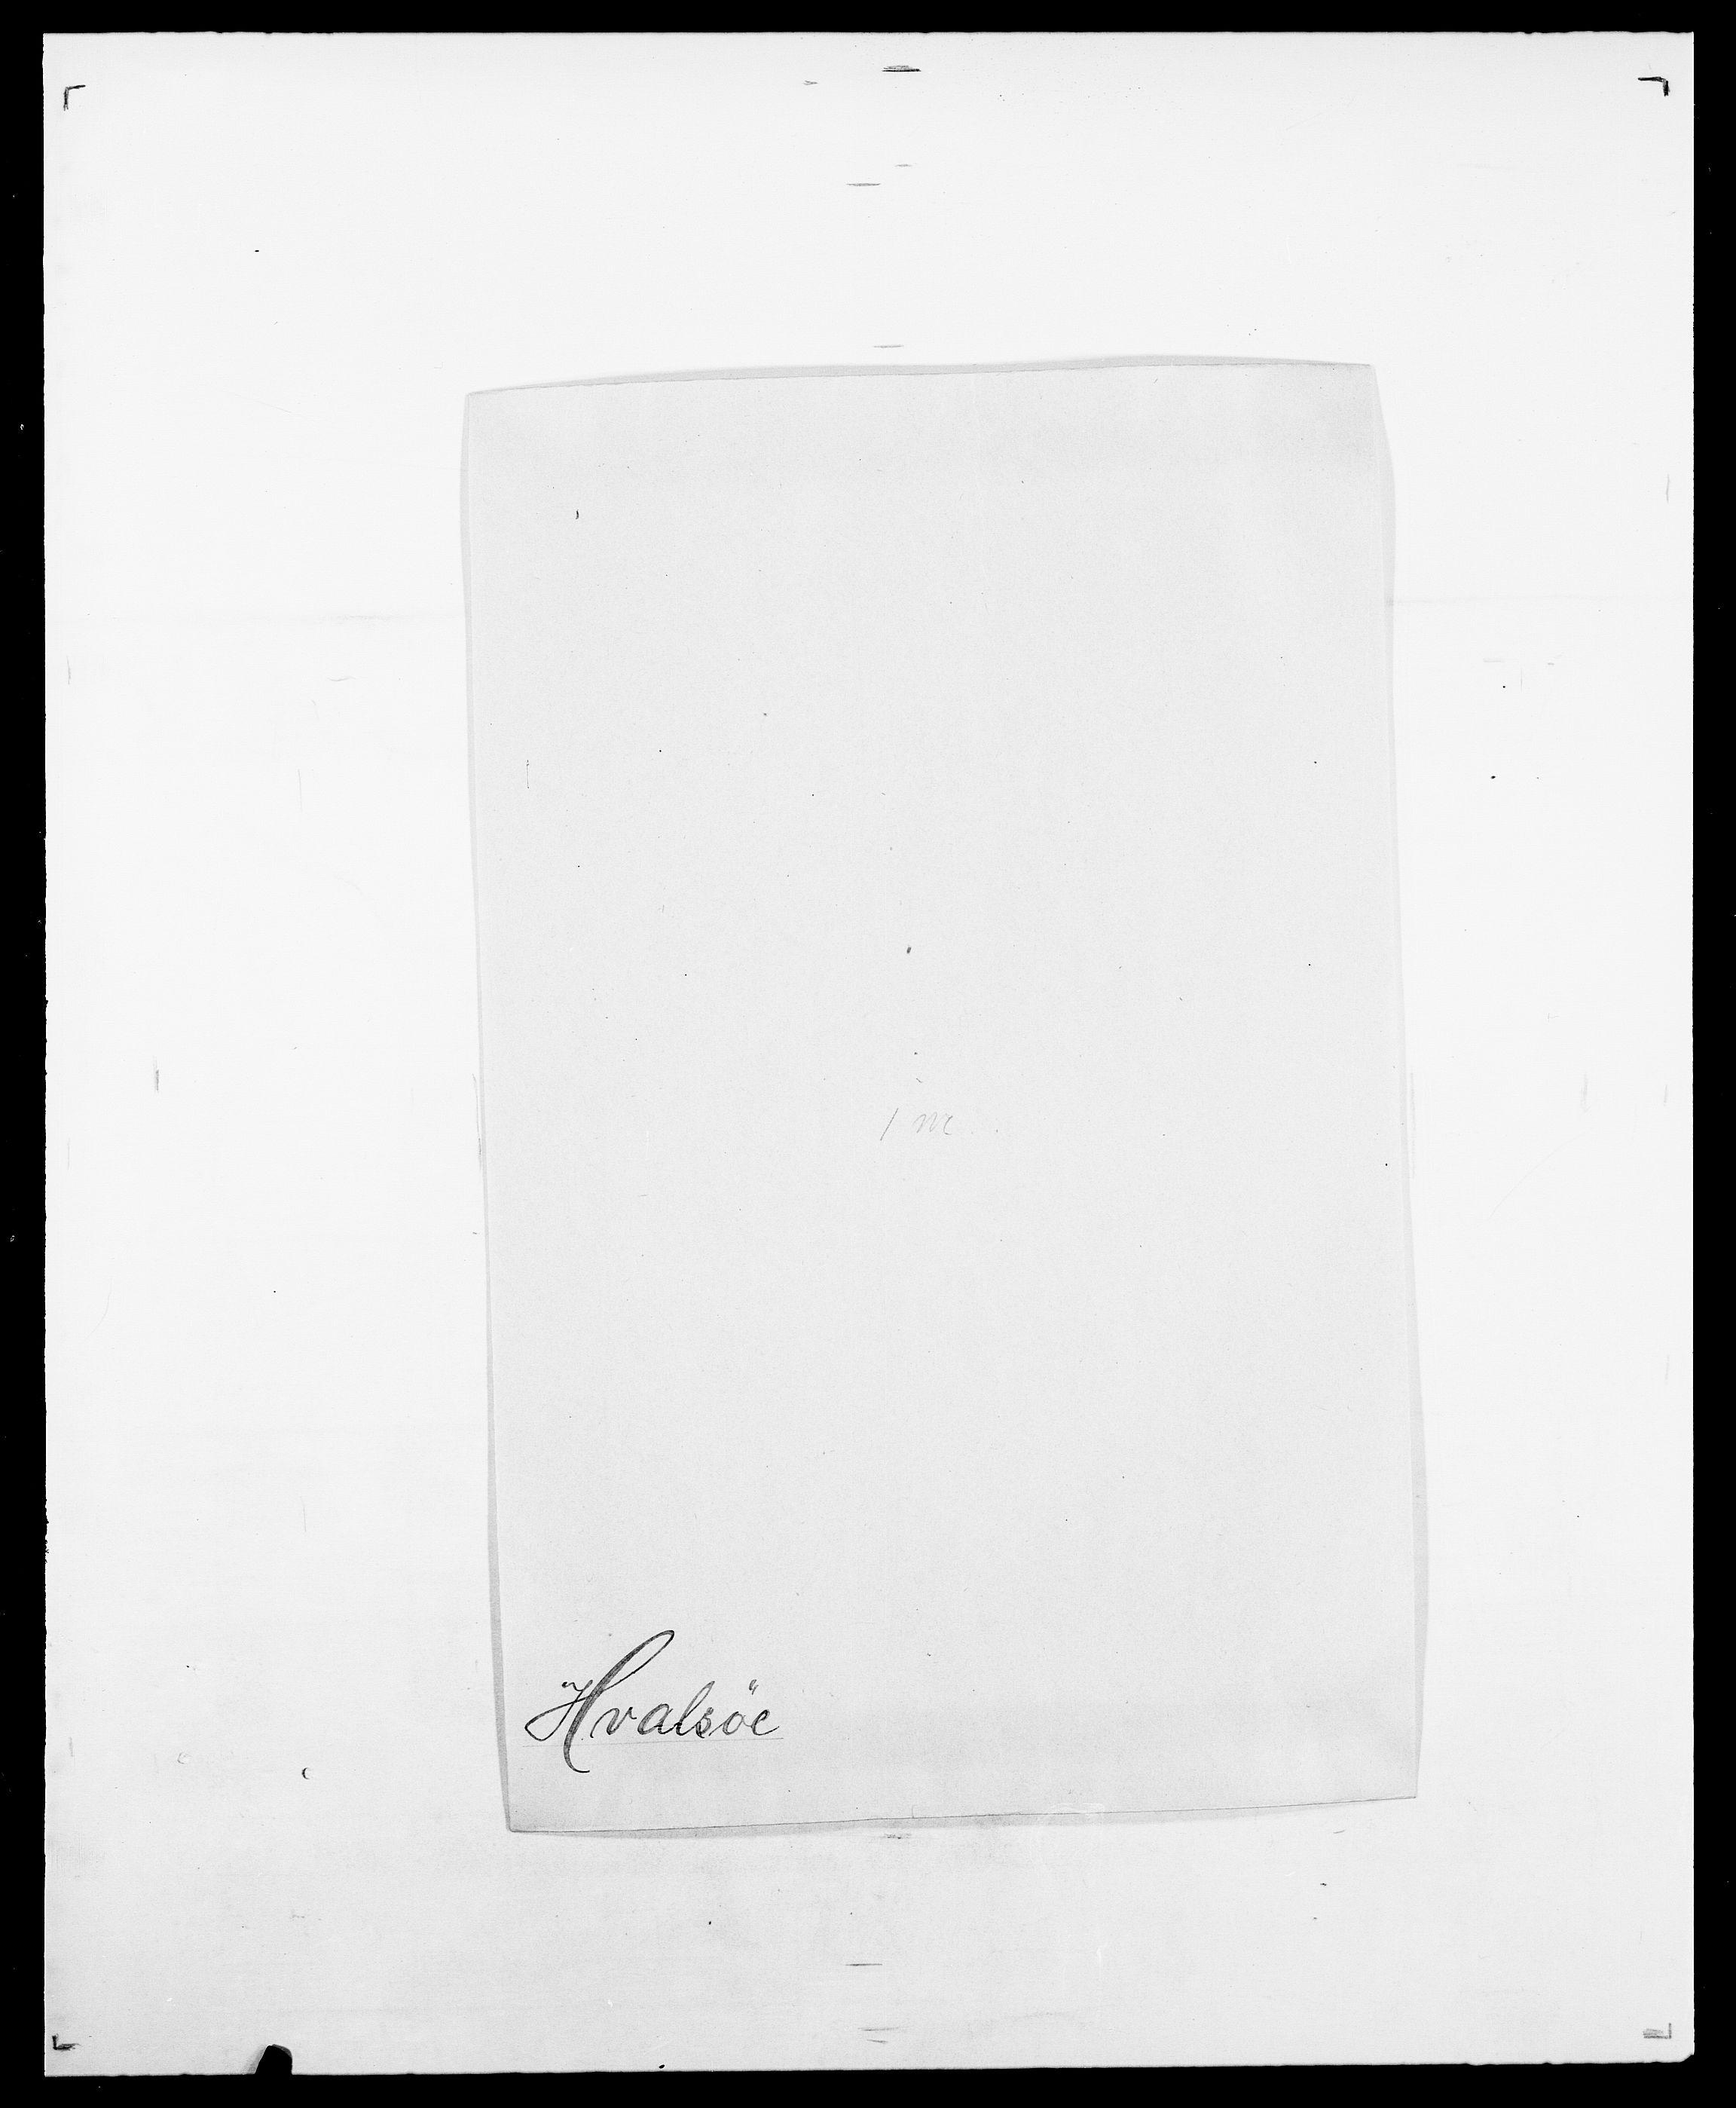 SAO, Delgobe, Charles Antoine - samling, D/Da/L0019: van der Hude - Joys, s. 116